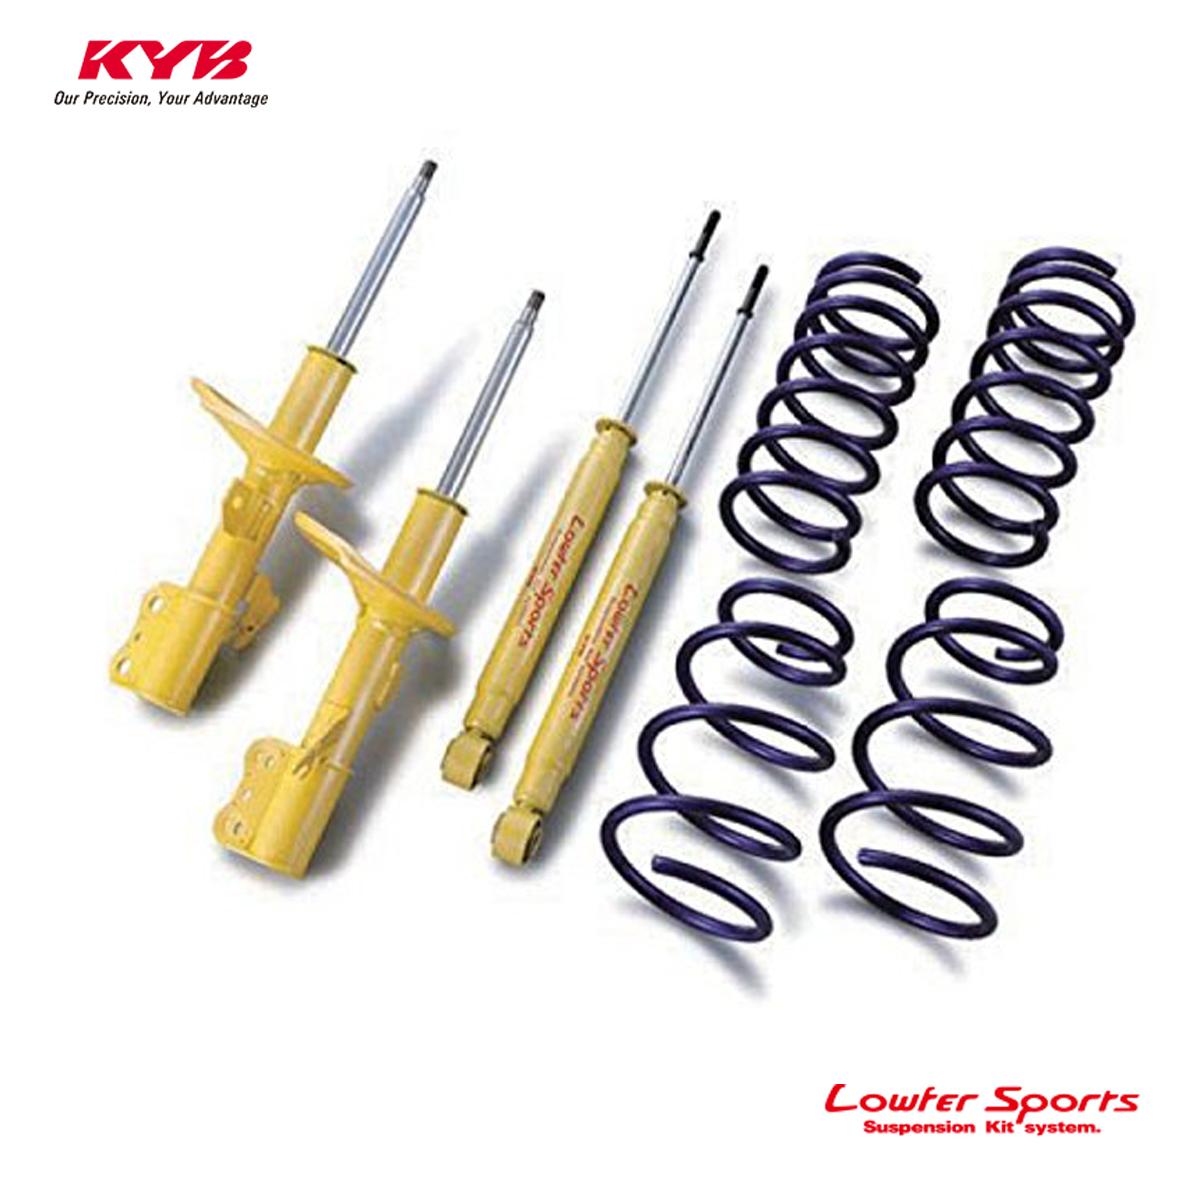 KYB カヤバ エスティマエミーナ TCR21G ショックアブソーバー サスペンションキット Lowfer Sports LKIT-TCR21G 配送先条件有り